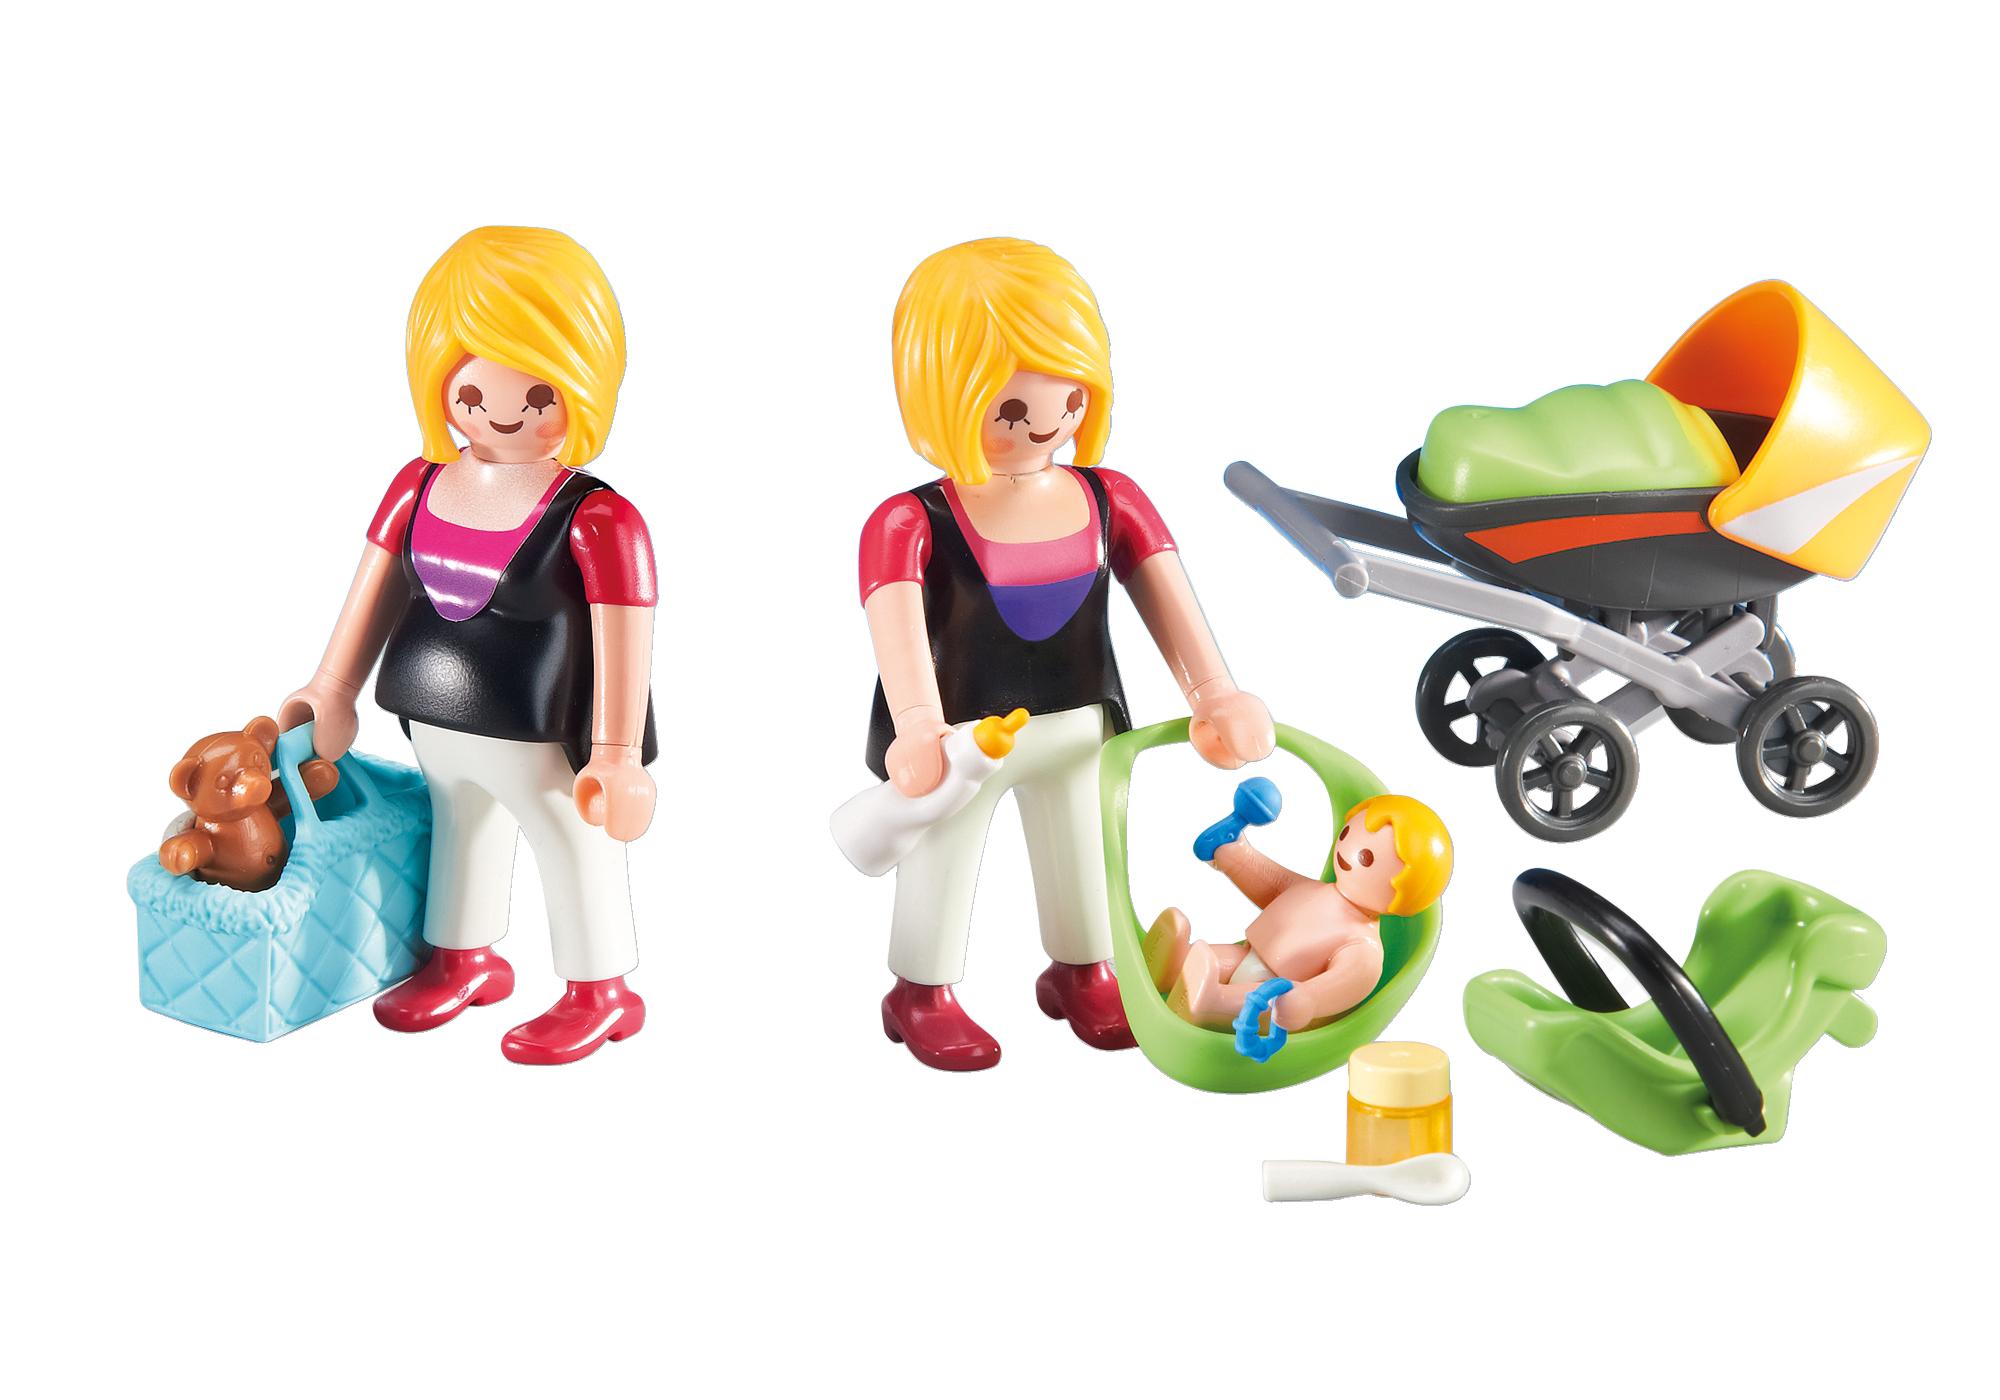 http://media.playmobil.com/i/playmobil/6447_product_detail/Embarazada y Mamá con Bebé